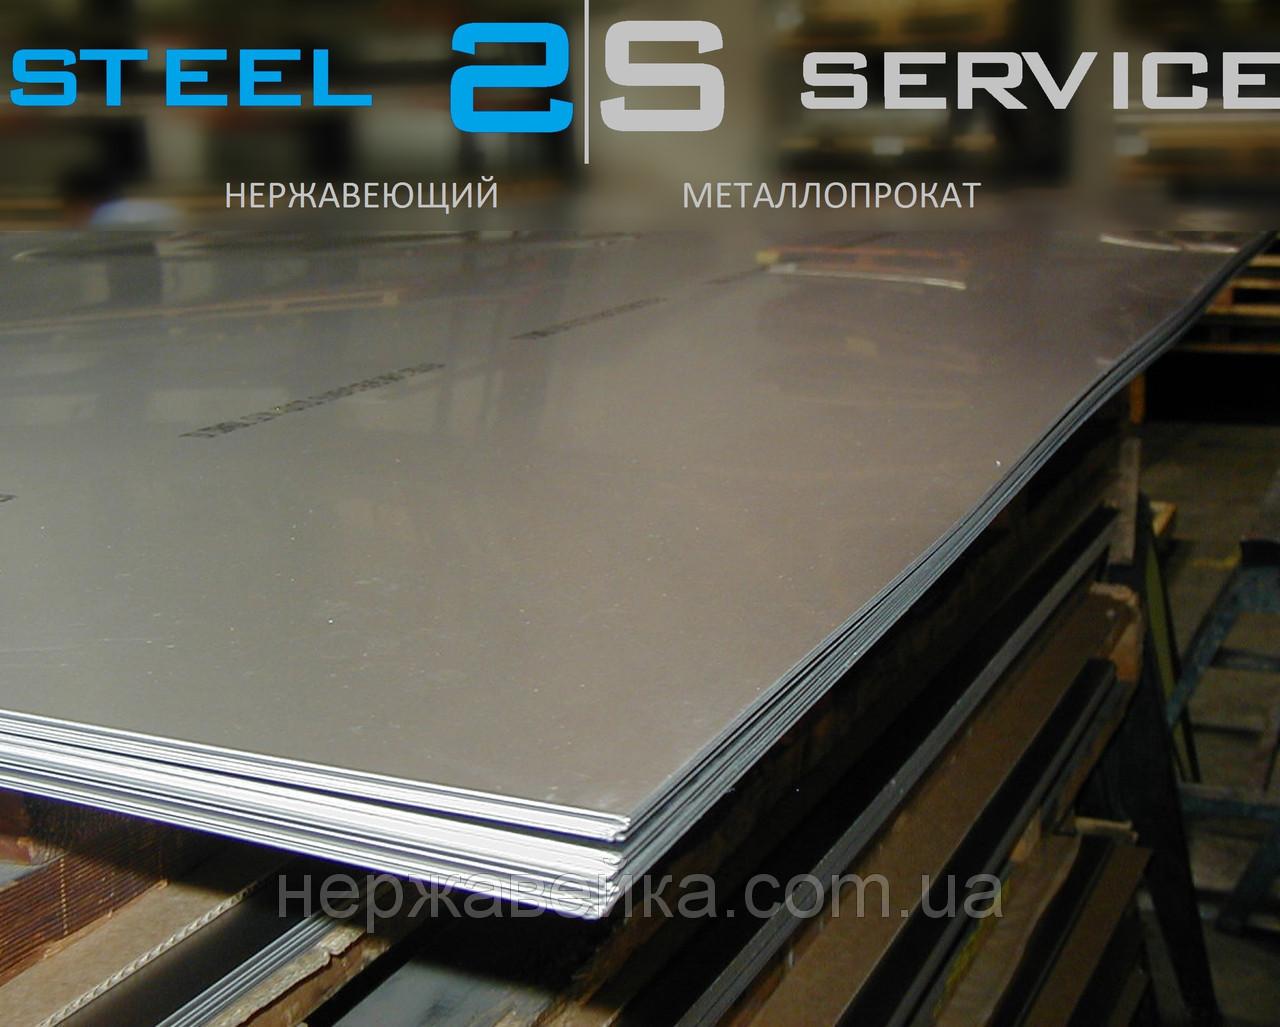 Листовая нержавейка 8х1500х6000мм  AISI 316Ti(10Х17Н13М2Т) F1 - горячекатанный,  кислотостойкий